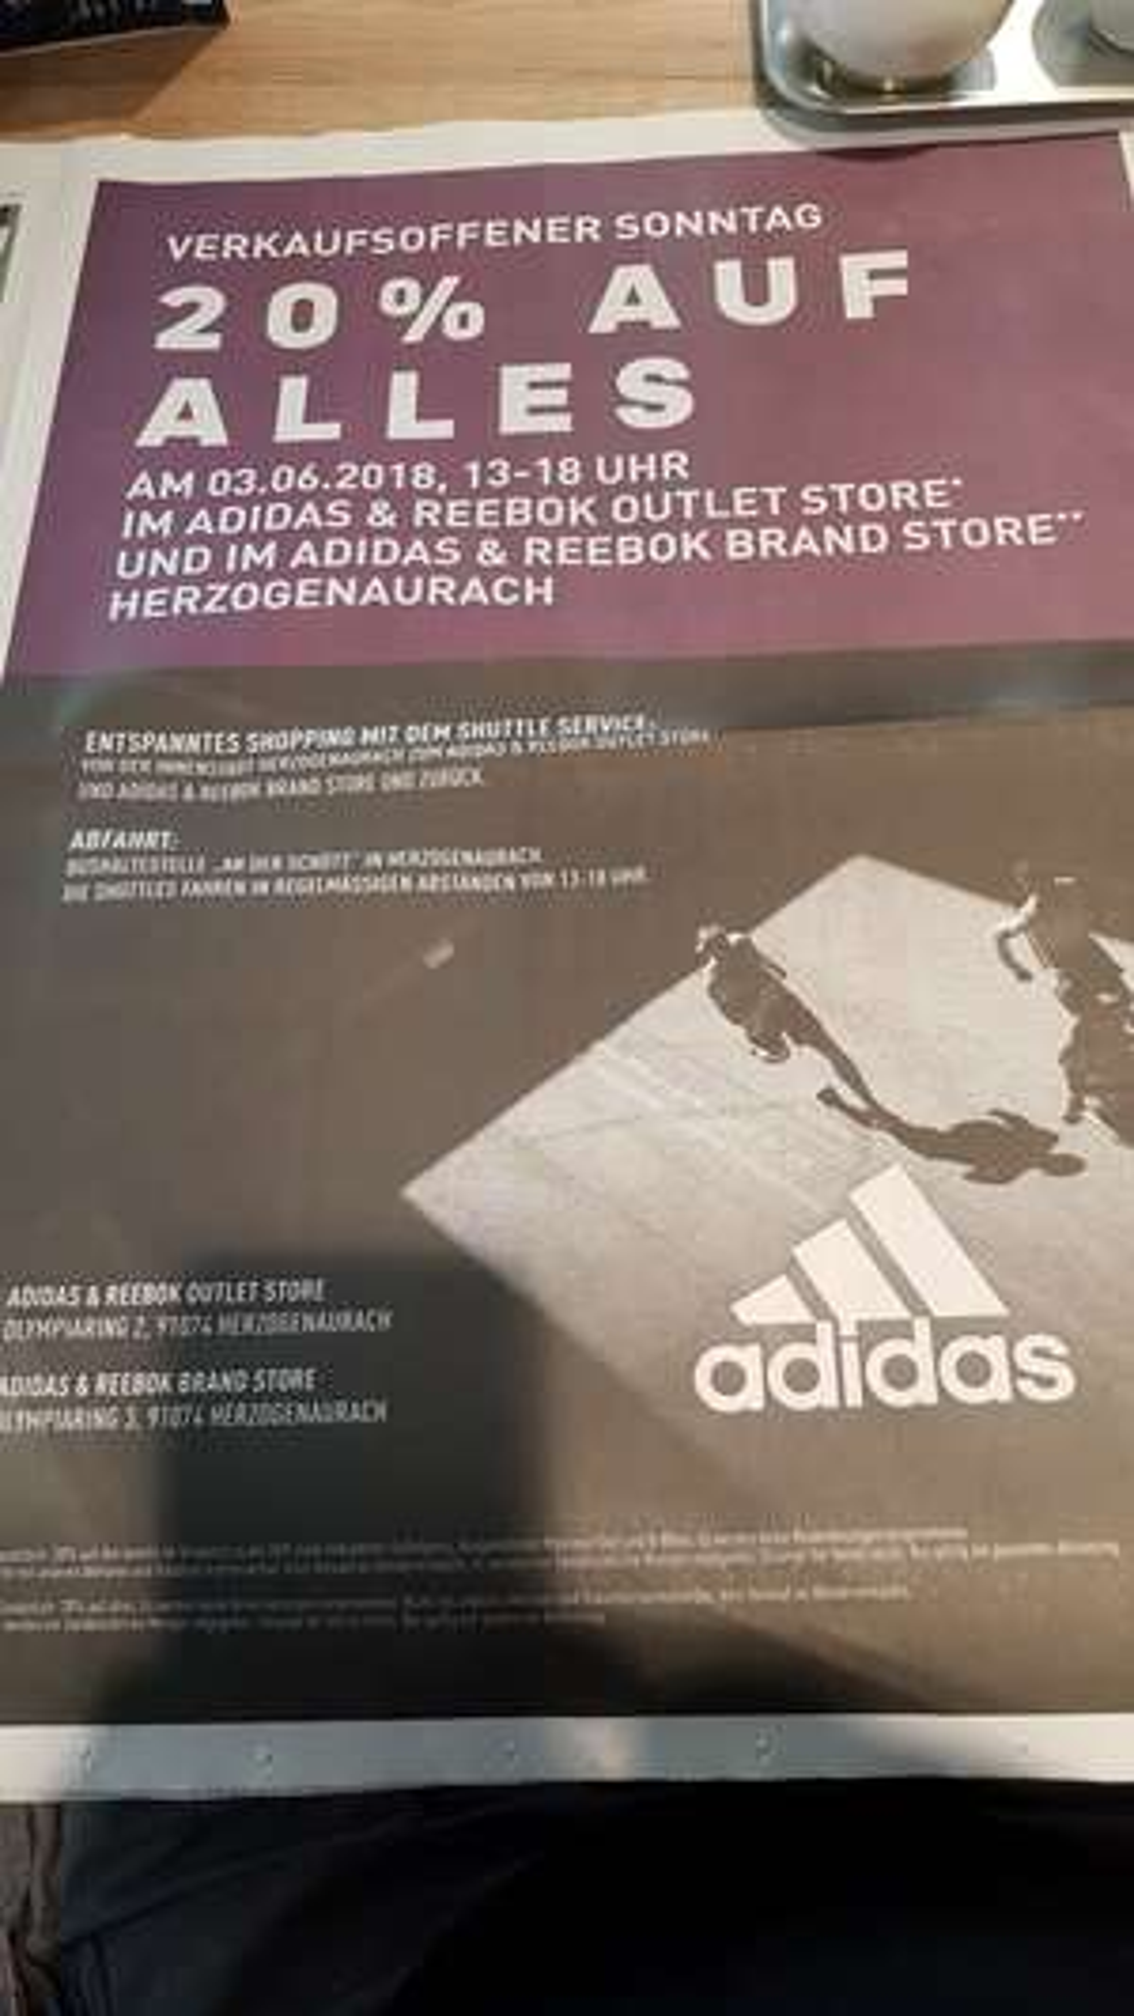 20% auf alles! Adidas Outlet